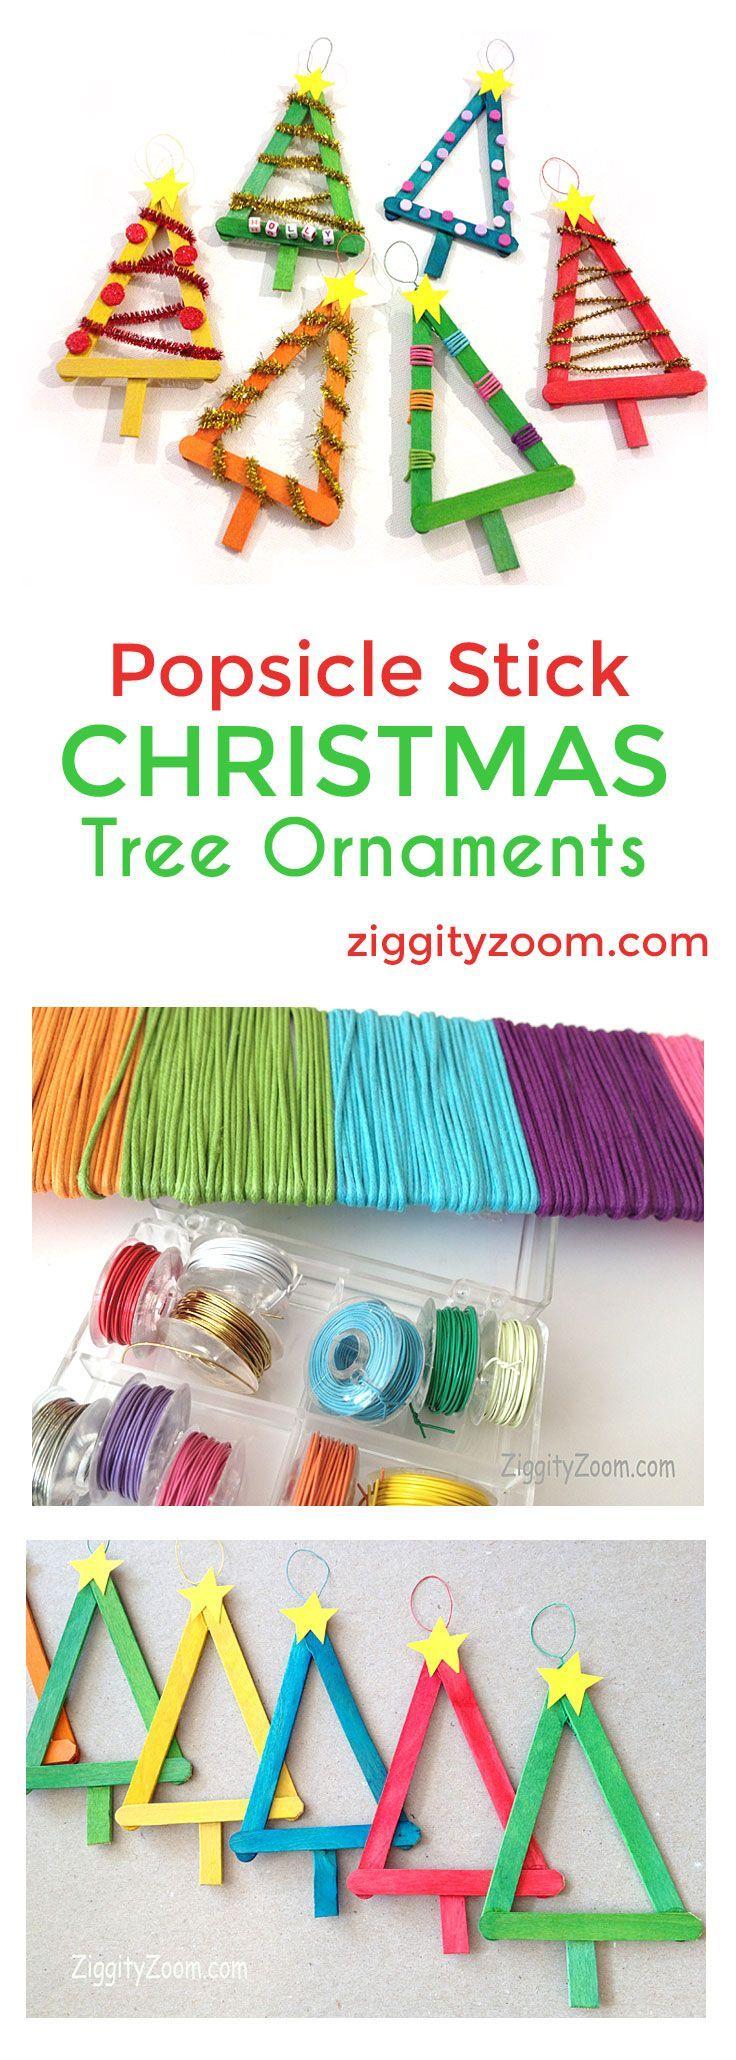 Popsicle stick ornaments DIy Christmas Tree Popsicle Stick Ornaments- Colorful fun craft for kids